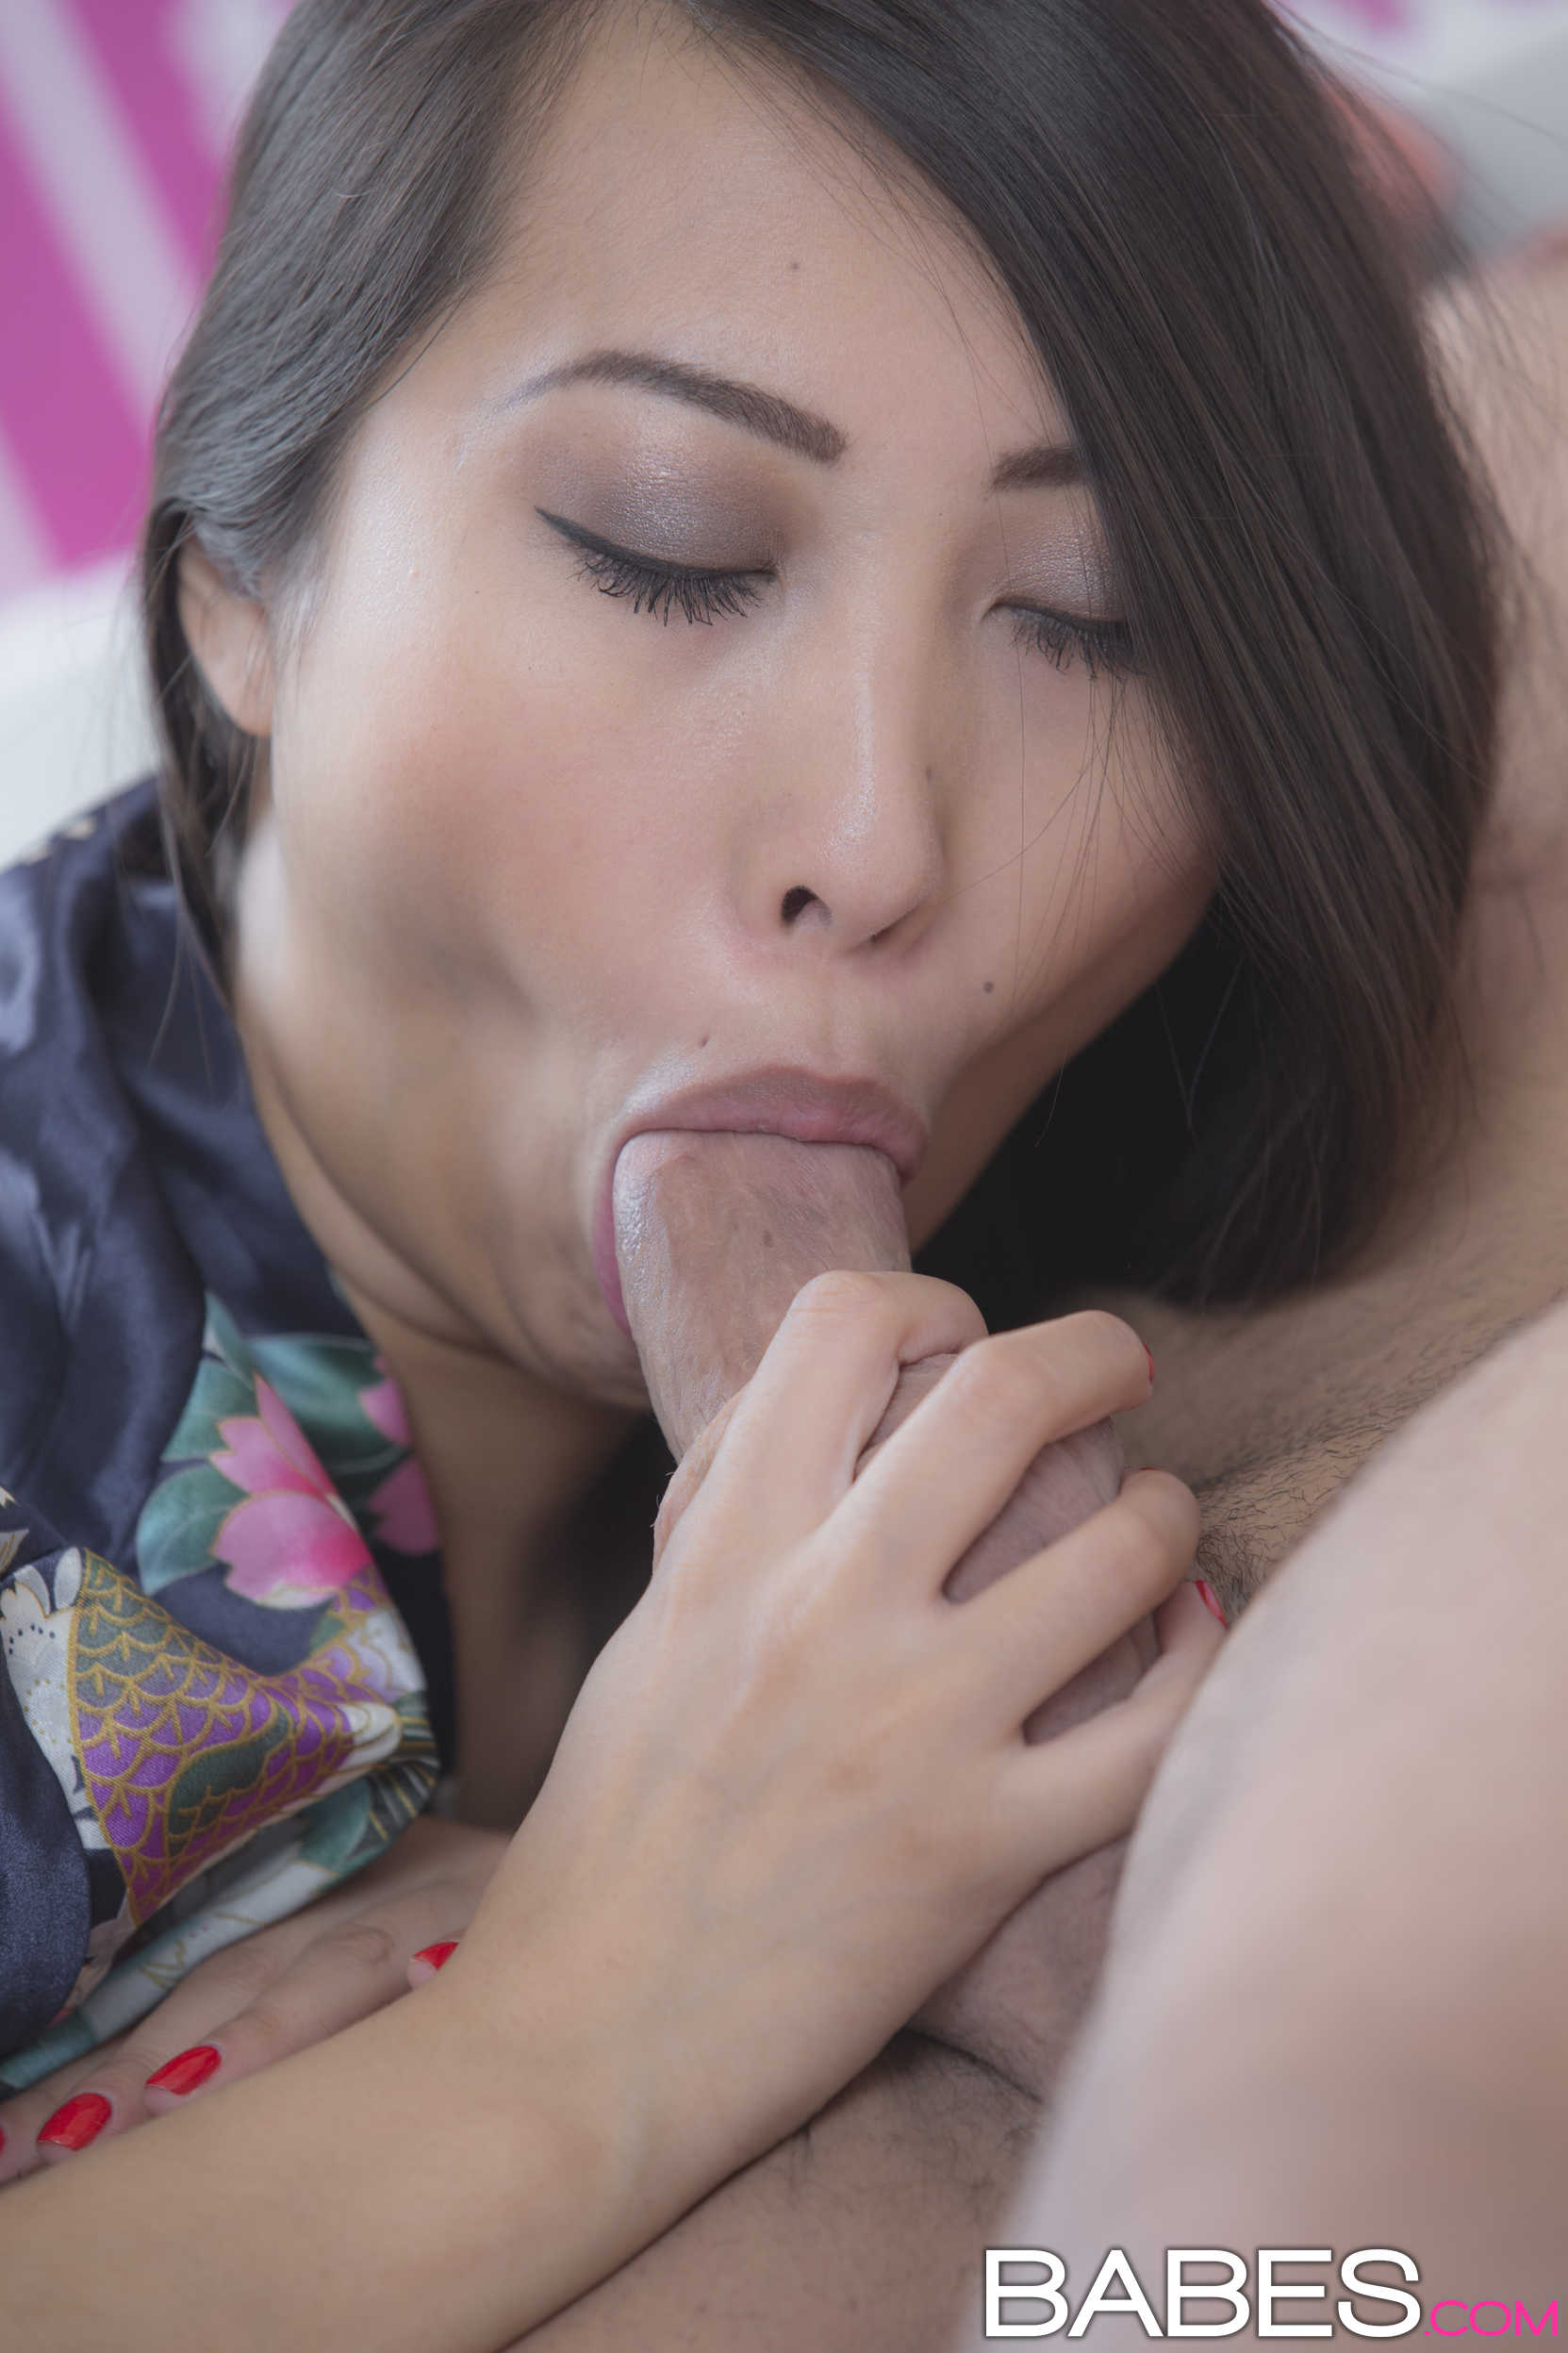 Teen sex image